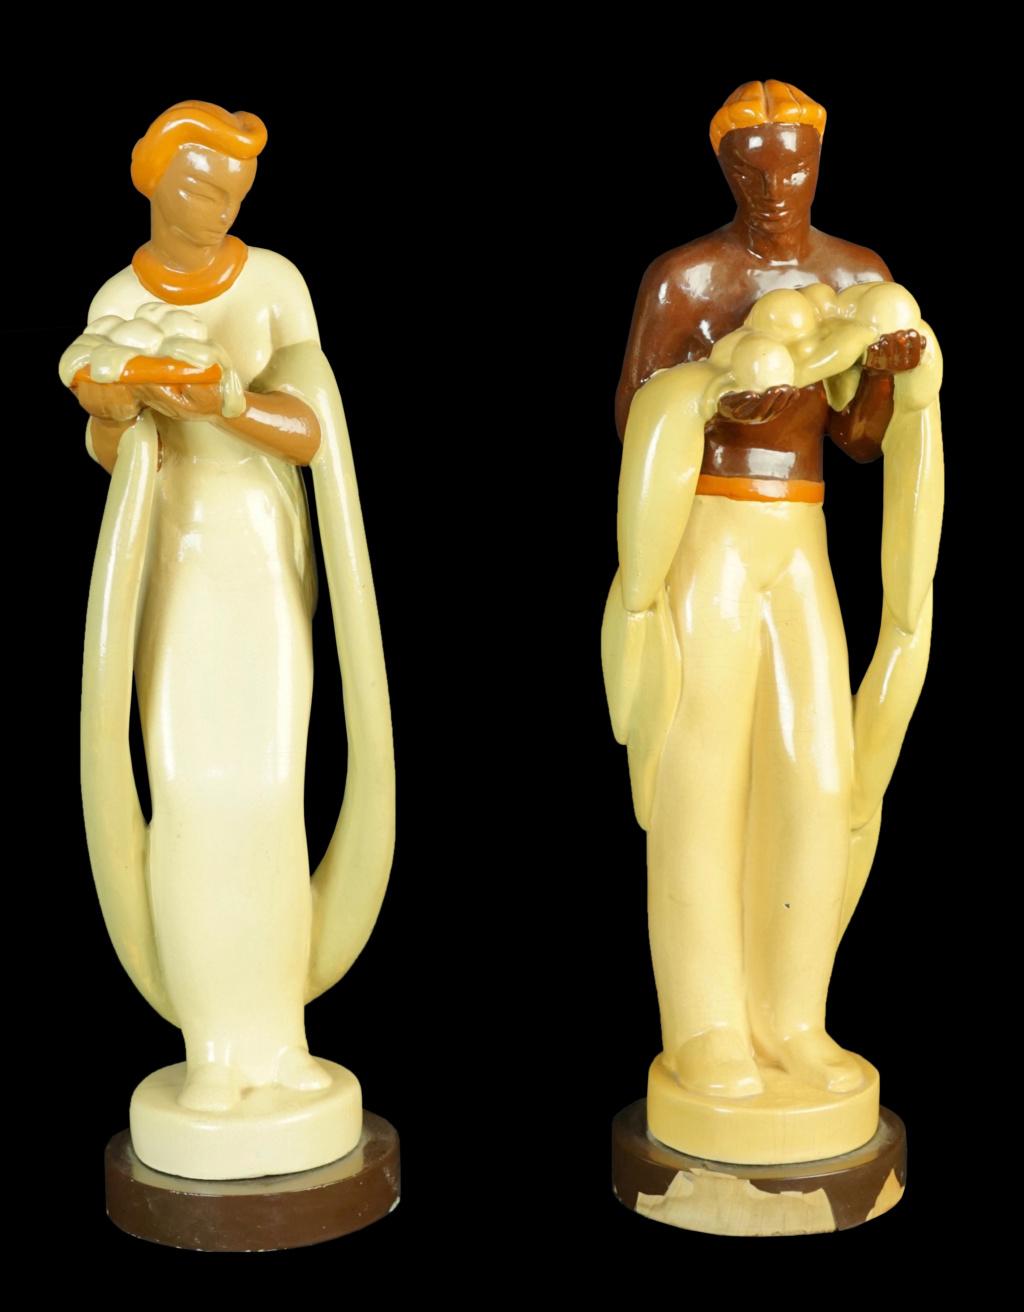 Pair of Pottery/Terra Cotta Figures Dsc04317